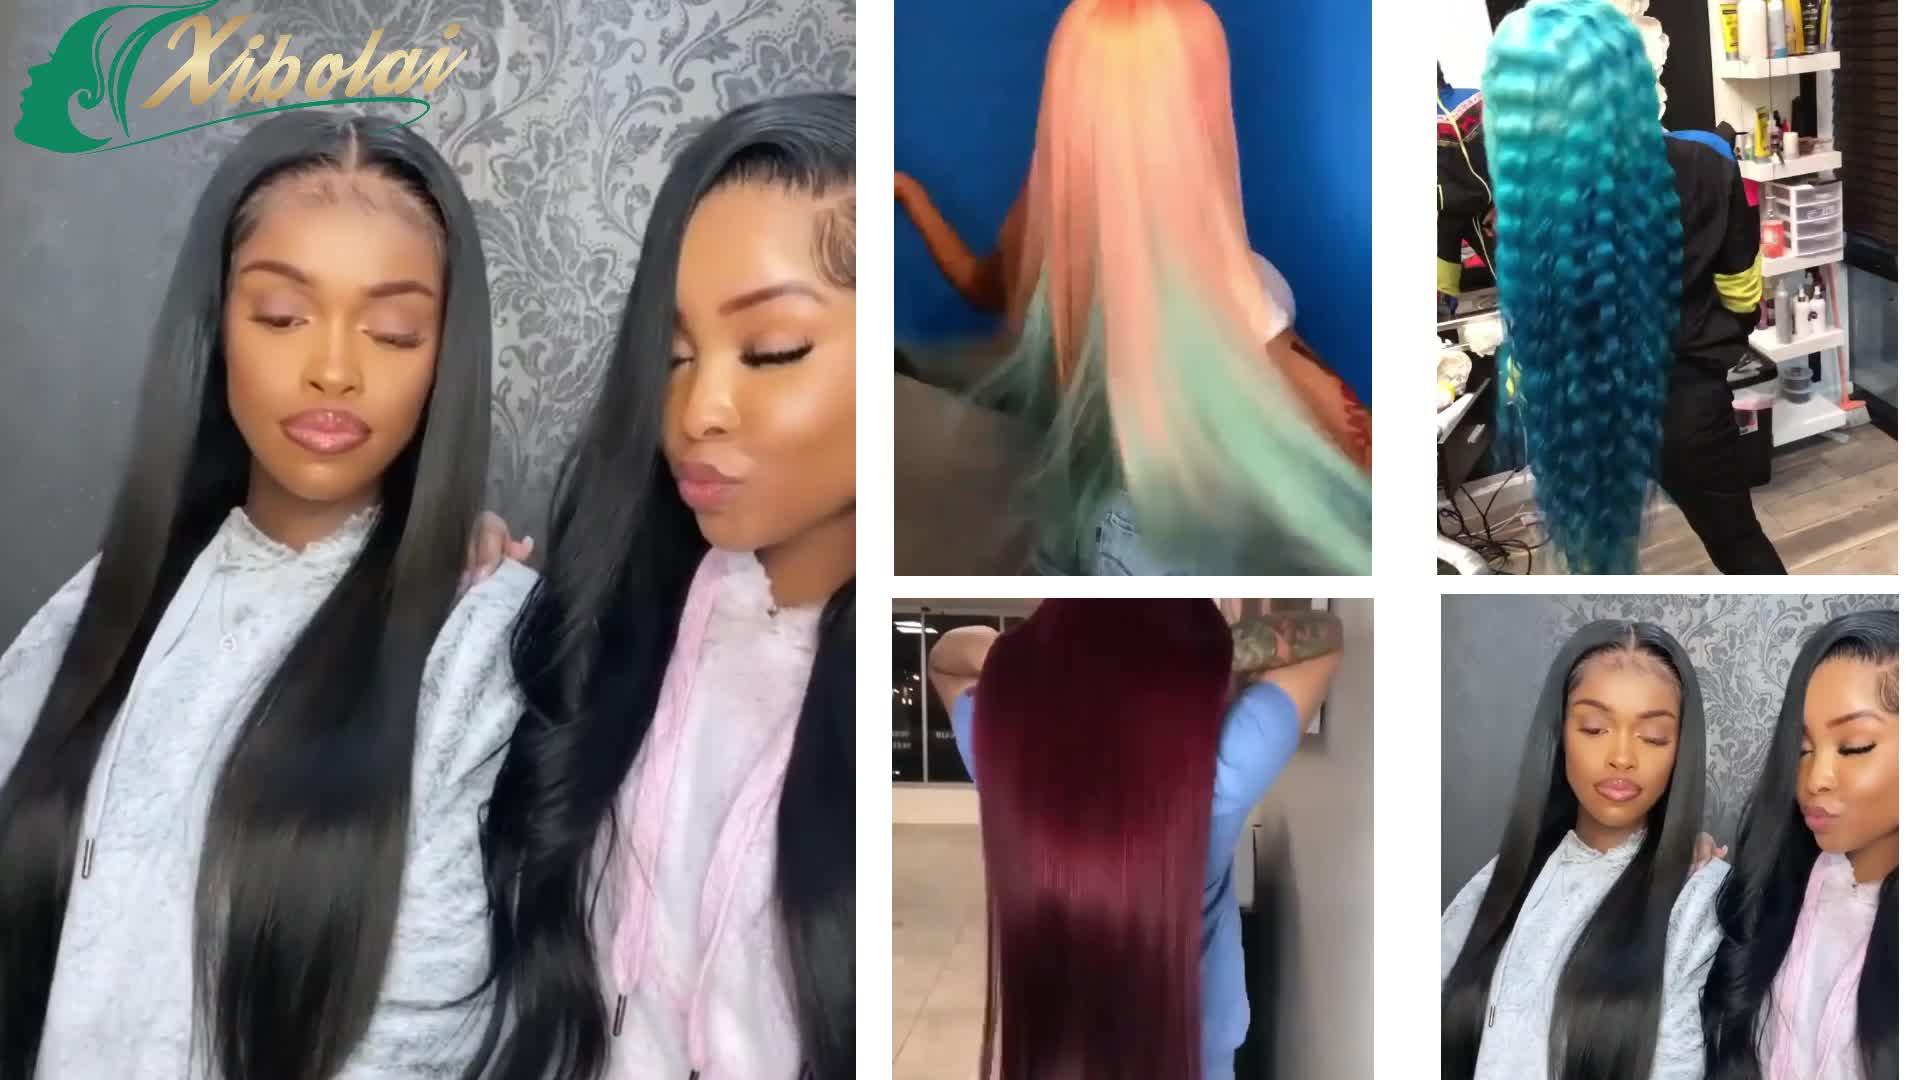 JcXBL OEM Custom virgin brazilian human hair closure wigs,100 colorful straight/curl wigs for pretty black women